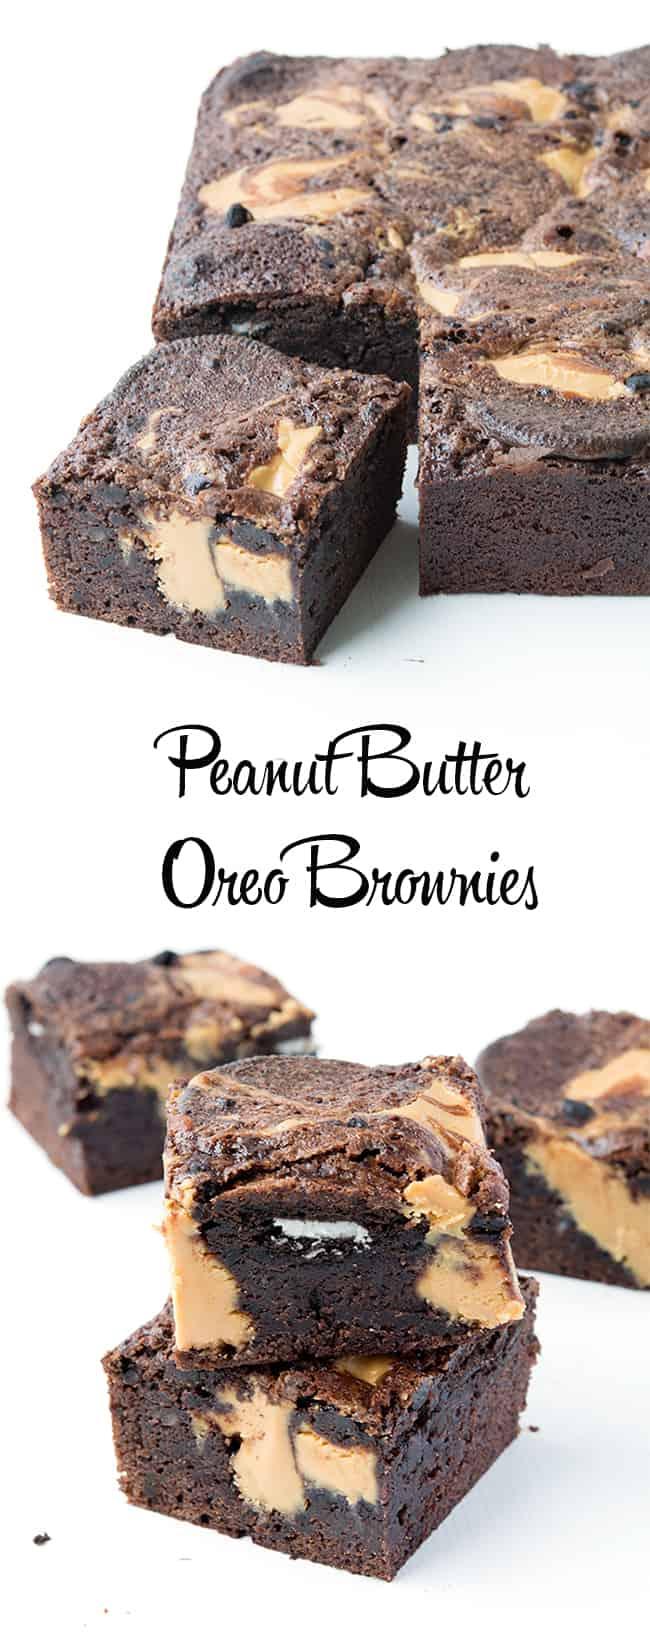 Peanut Butter Oreo Stuffed Brownies   Sweetest Menu